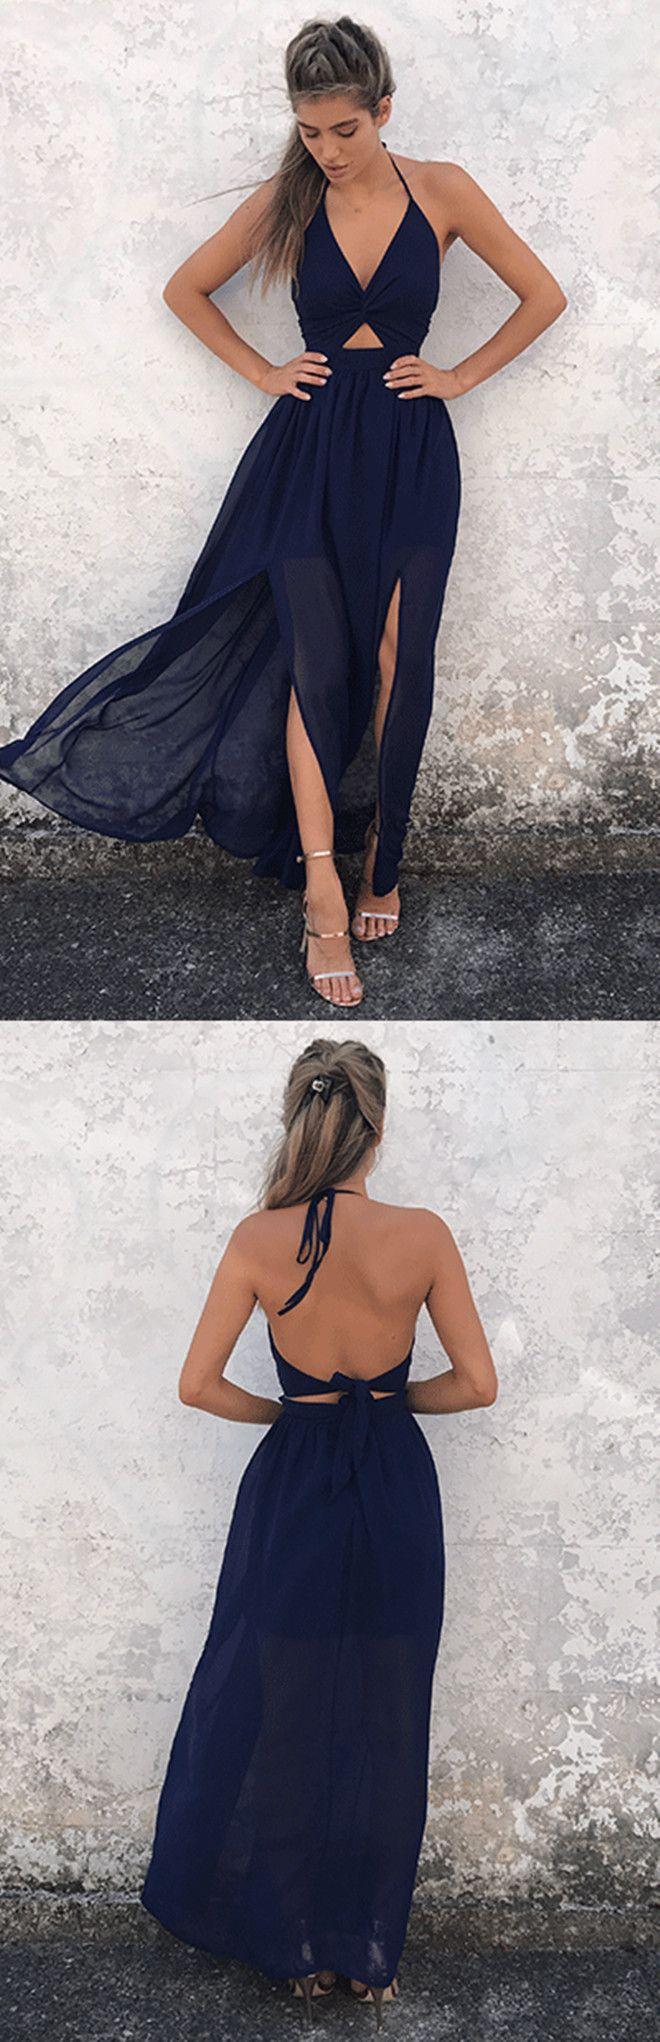 Aline halter backless navyblue chiffon prom dress navy blue prom